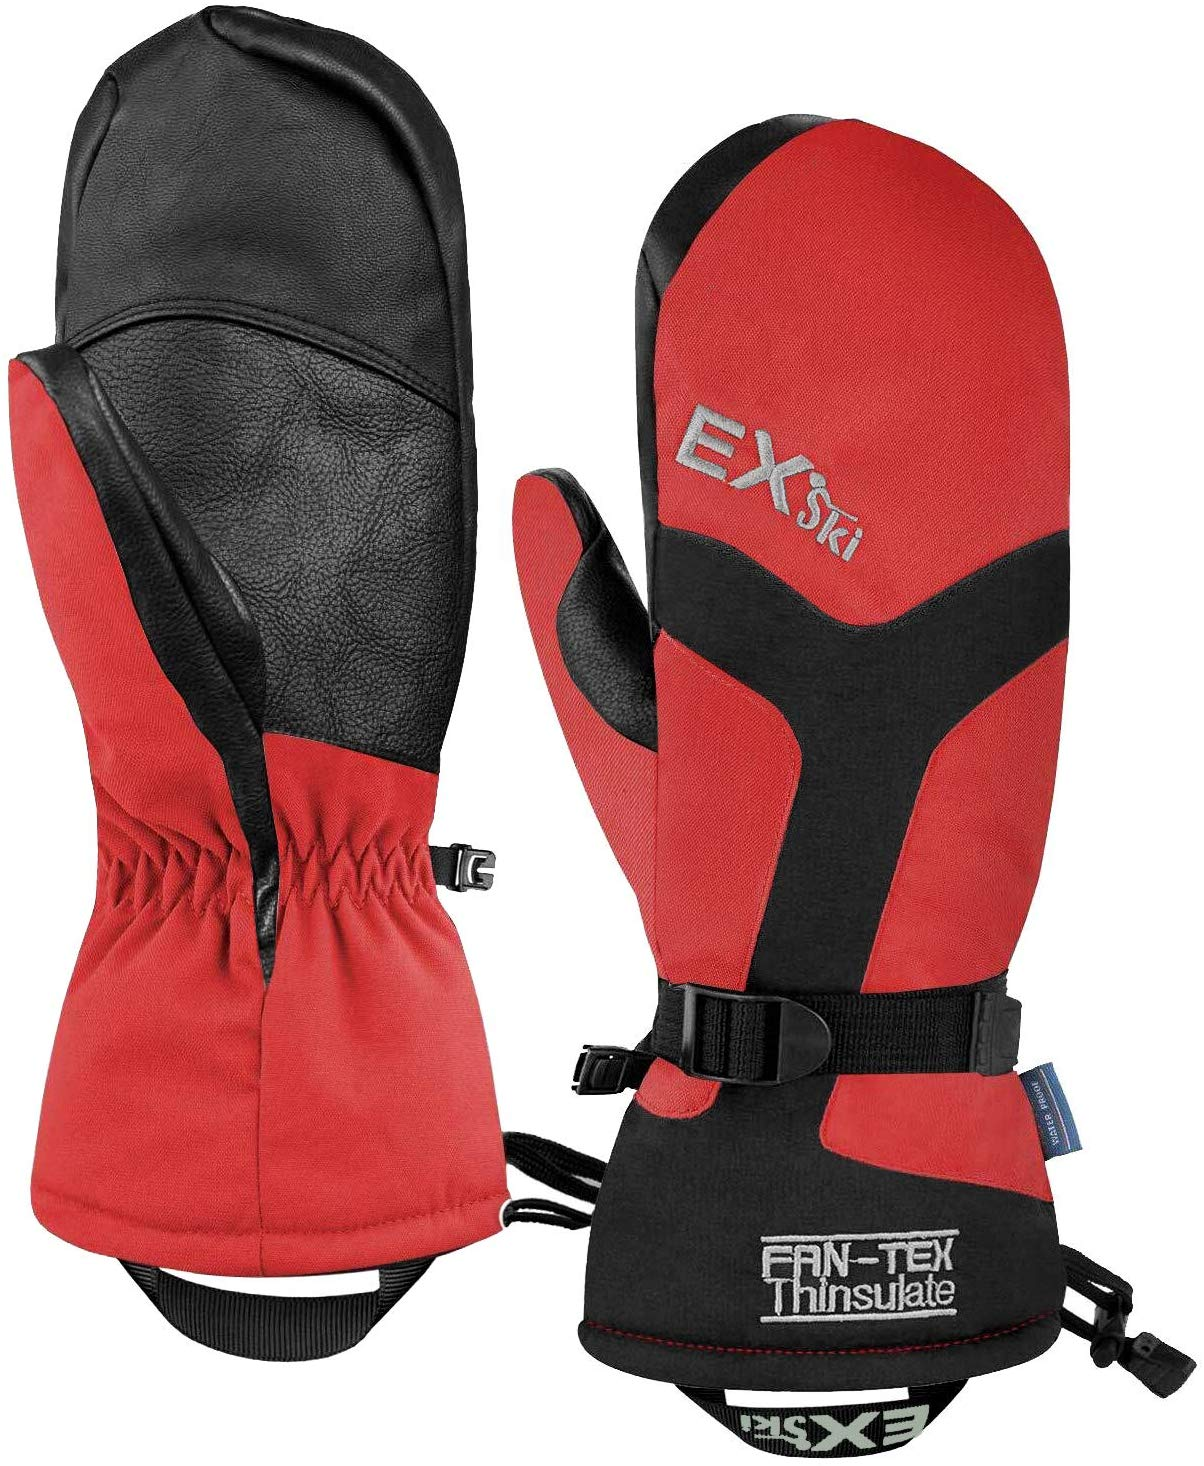 EXski Waterproof Women's Ski Mittens